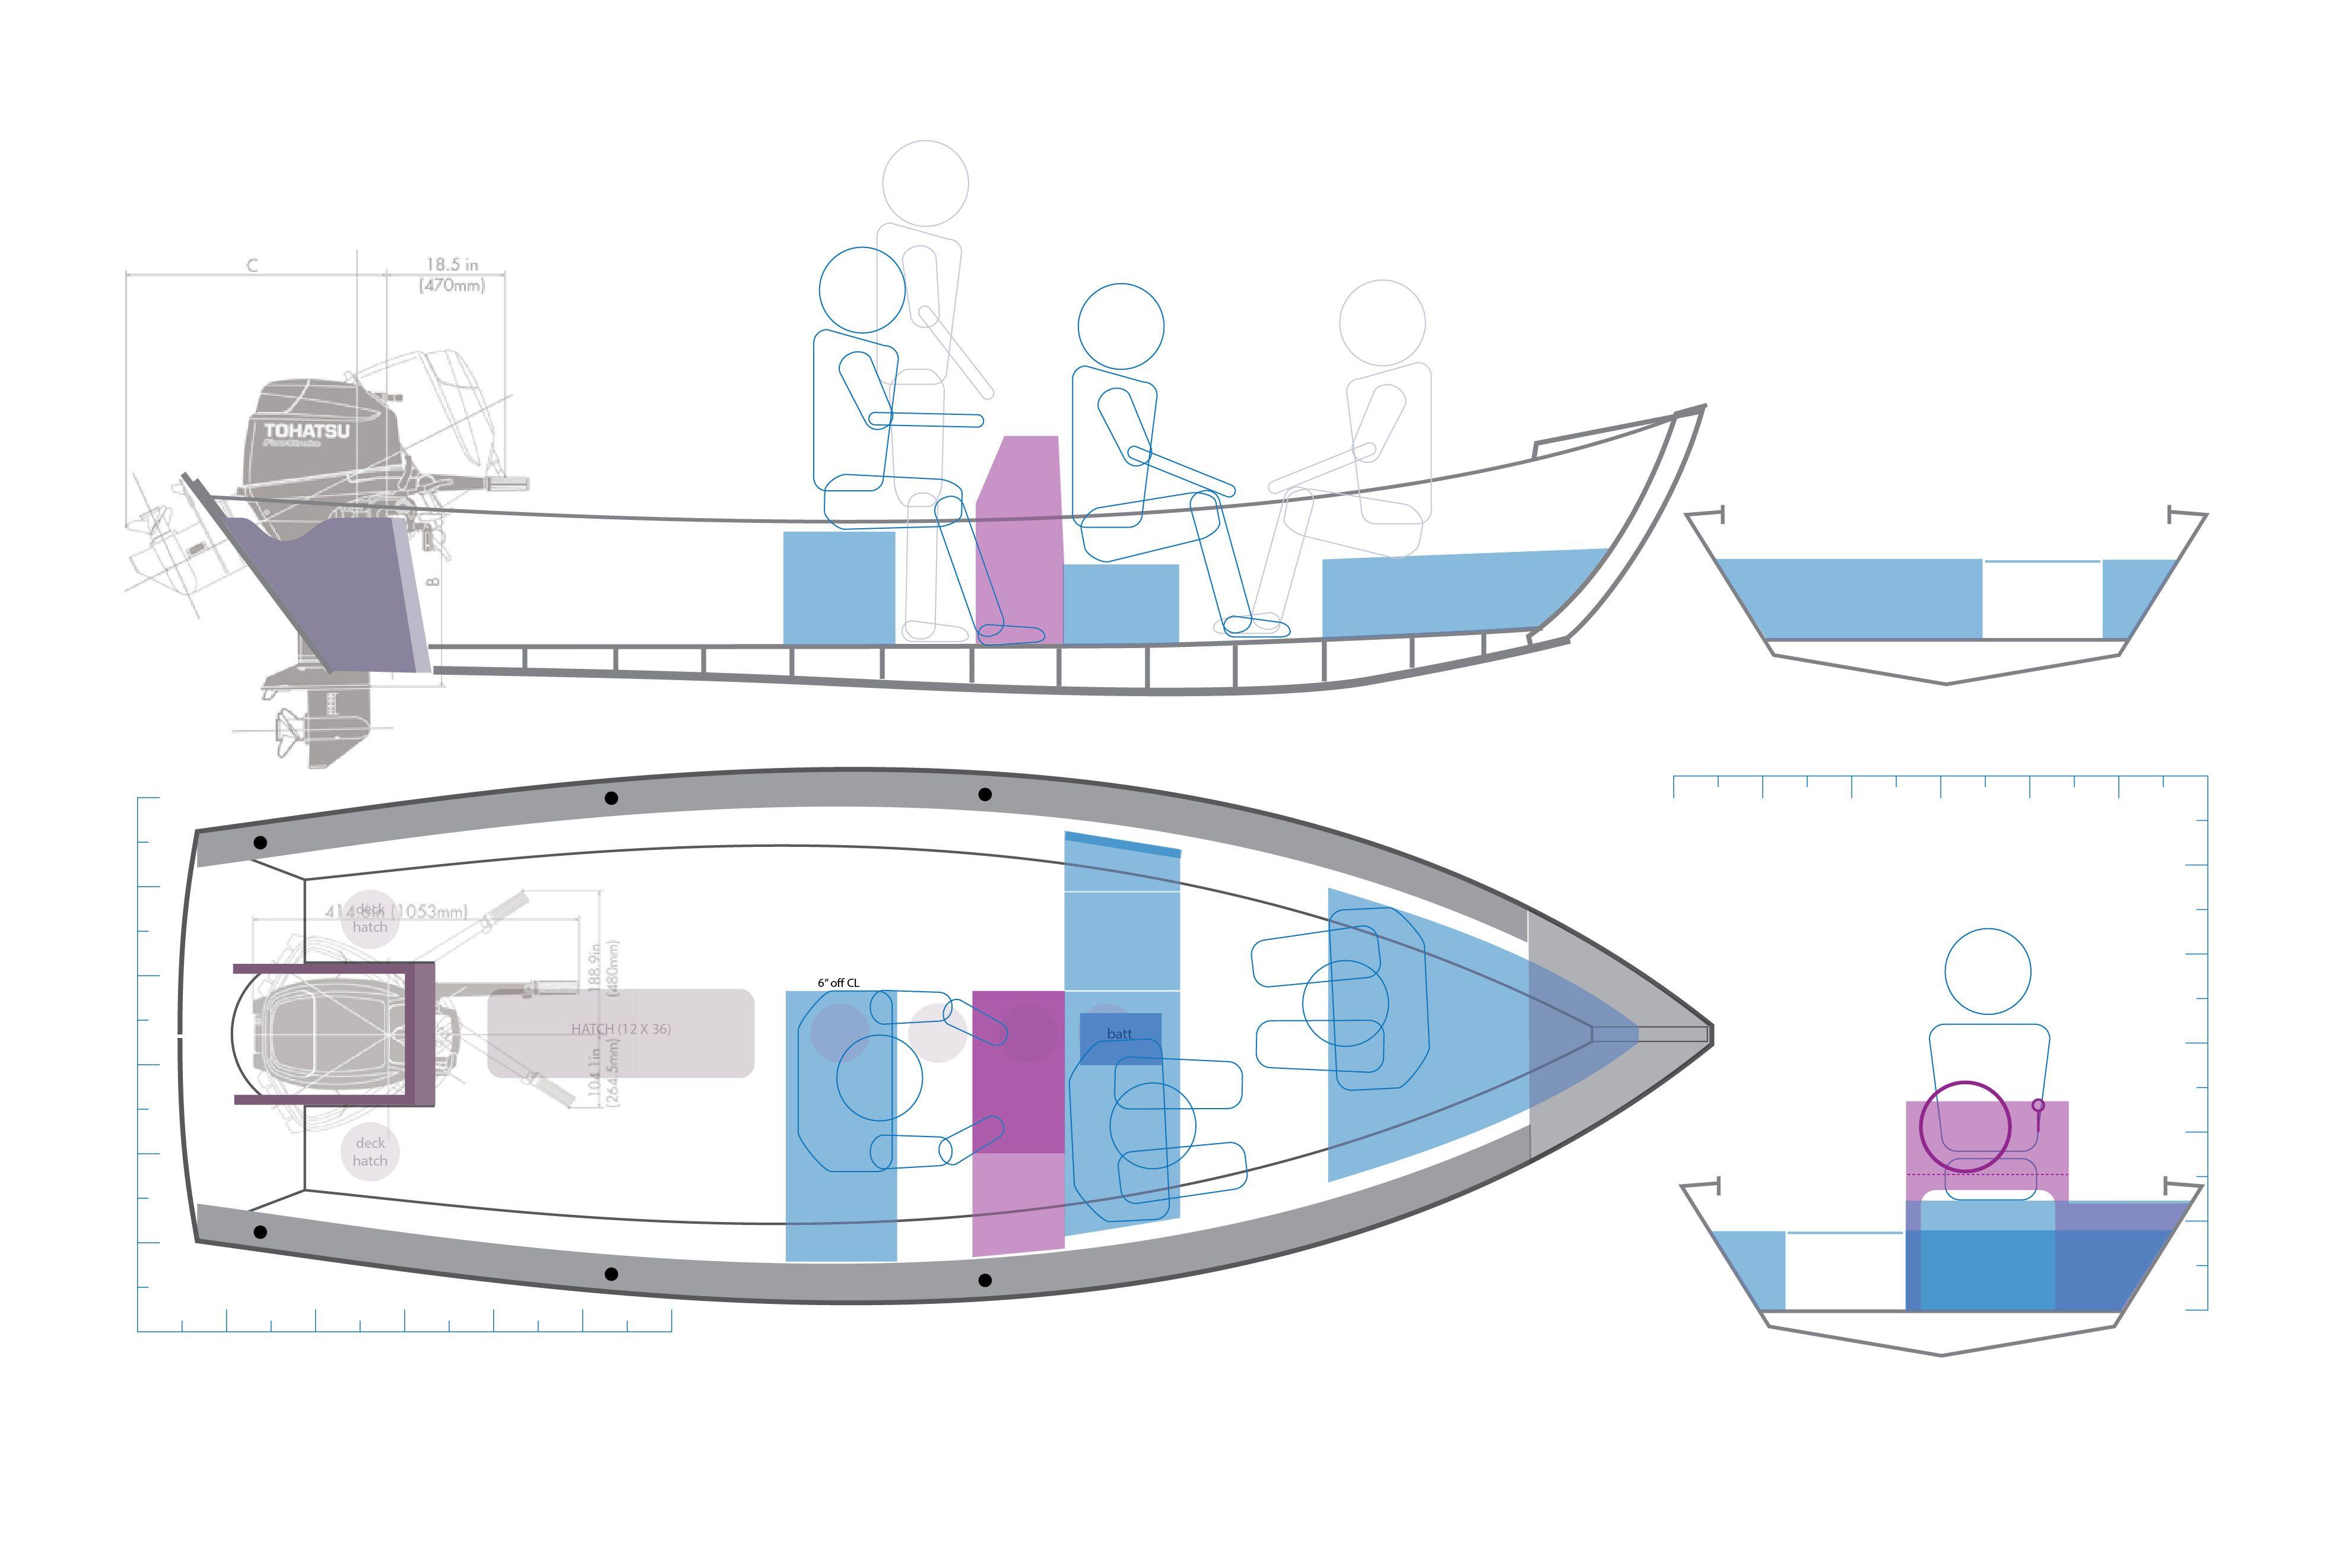 Boat Center Console Shifter Wiring Diagram Not Lossing Carolina Skif Library Rh 84 Yoobi De Yamaha Outboard Harness Duck